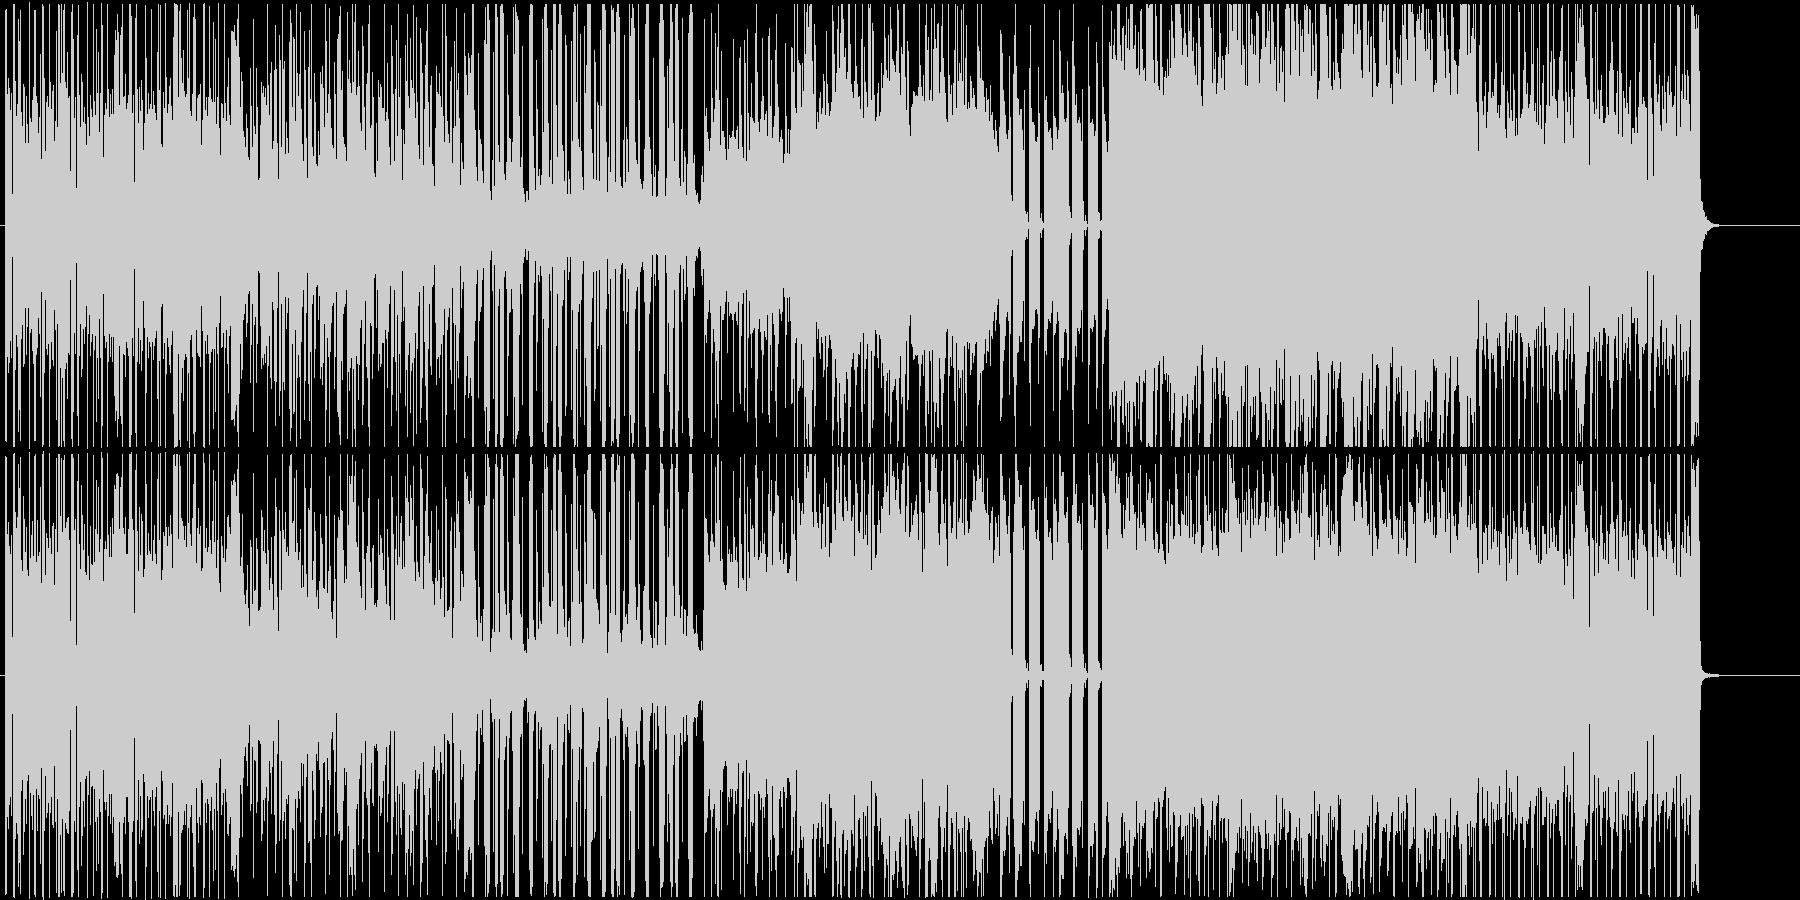 Phasesの未再生の波形